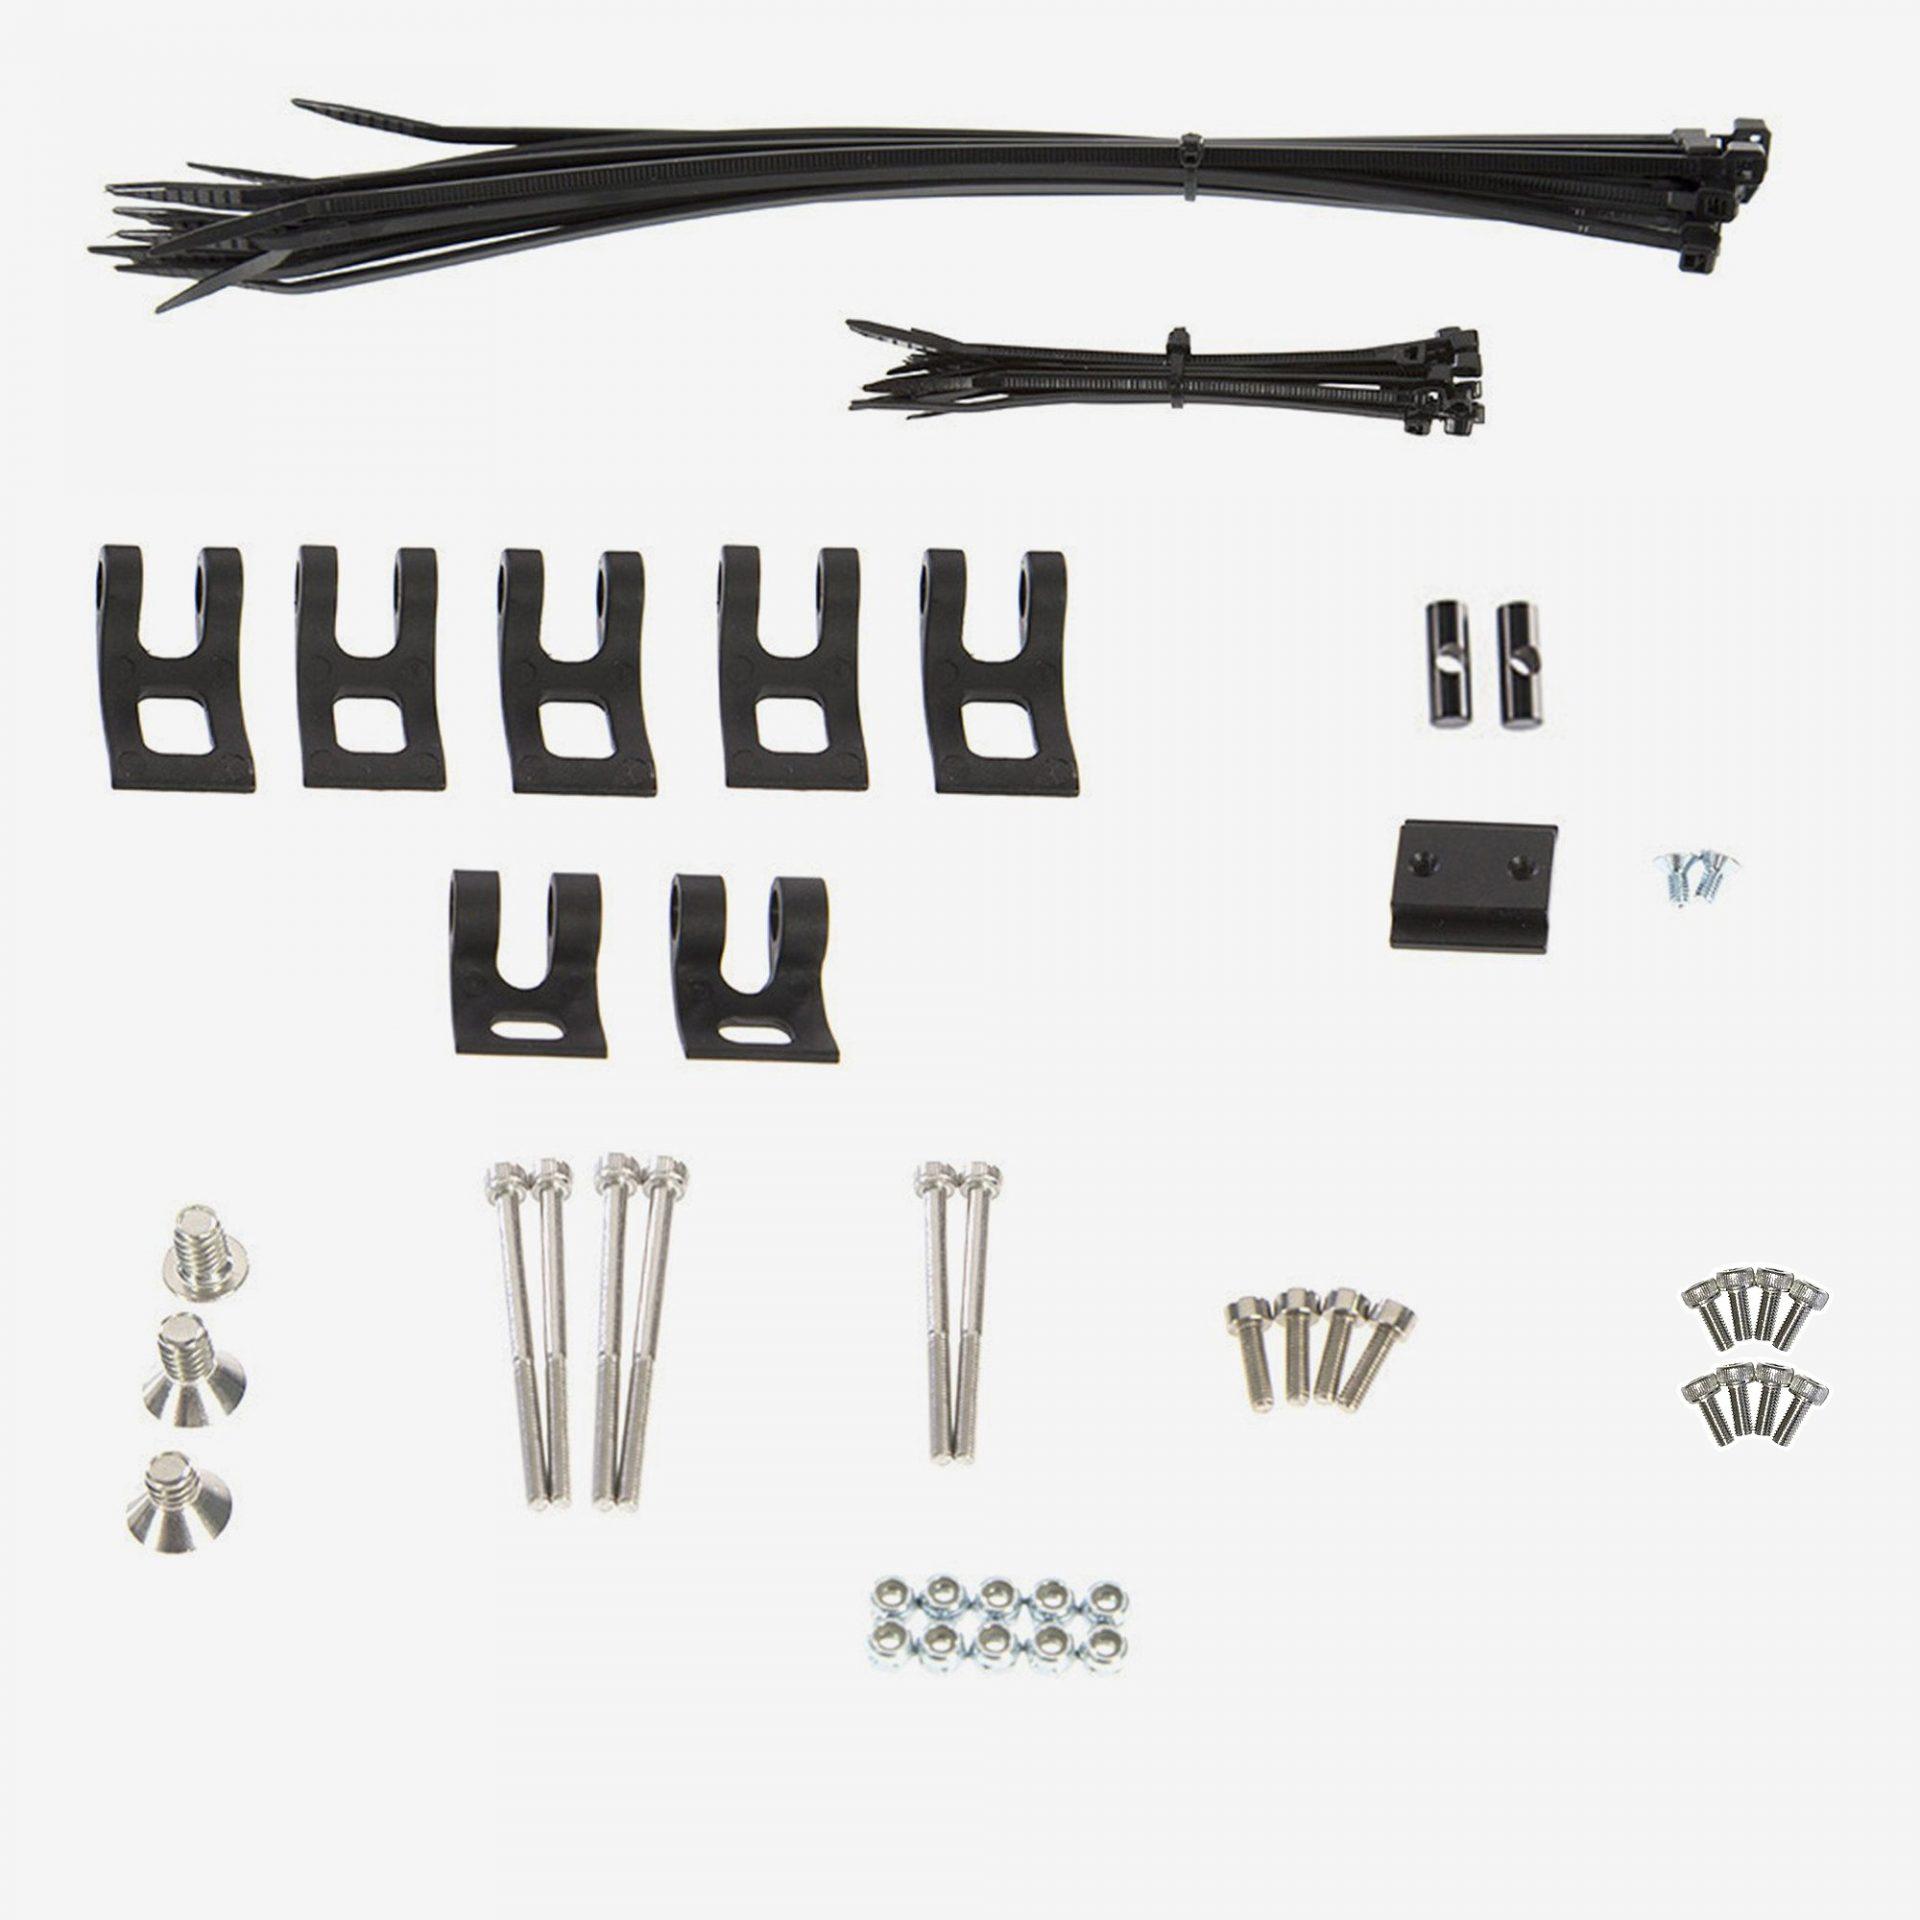 MōVI M5 Spare Parts Kit